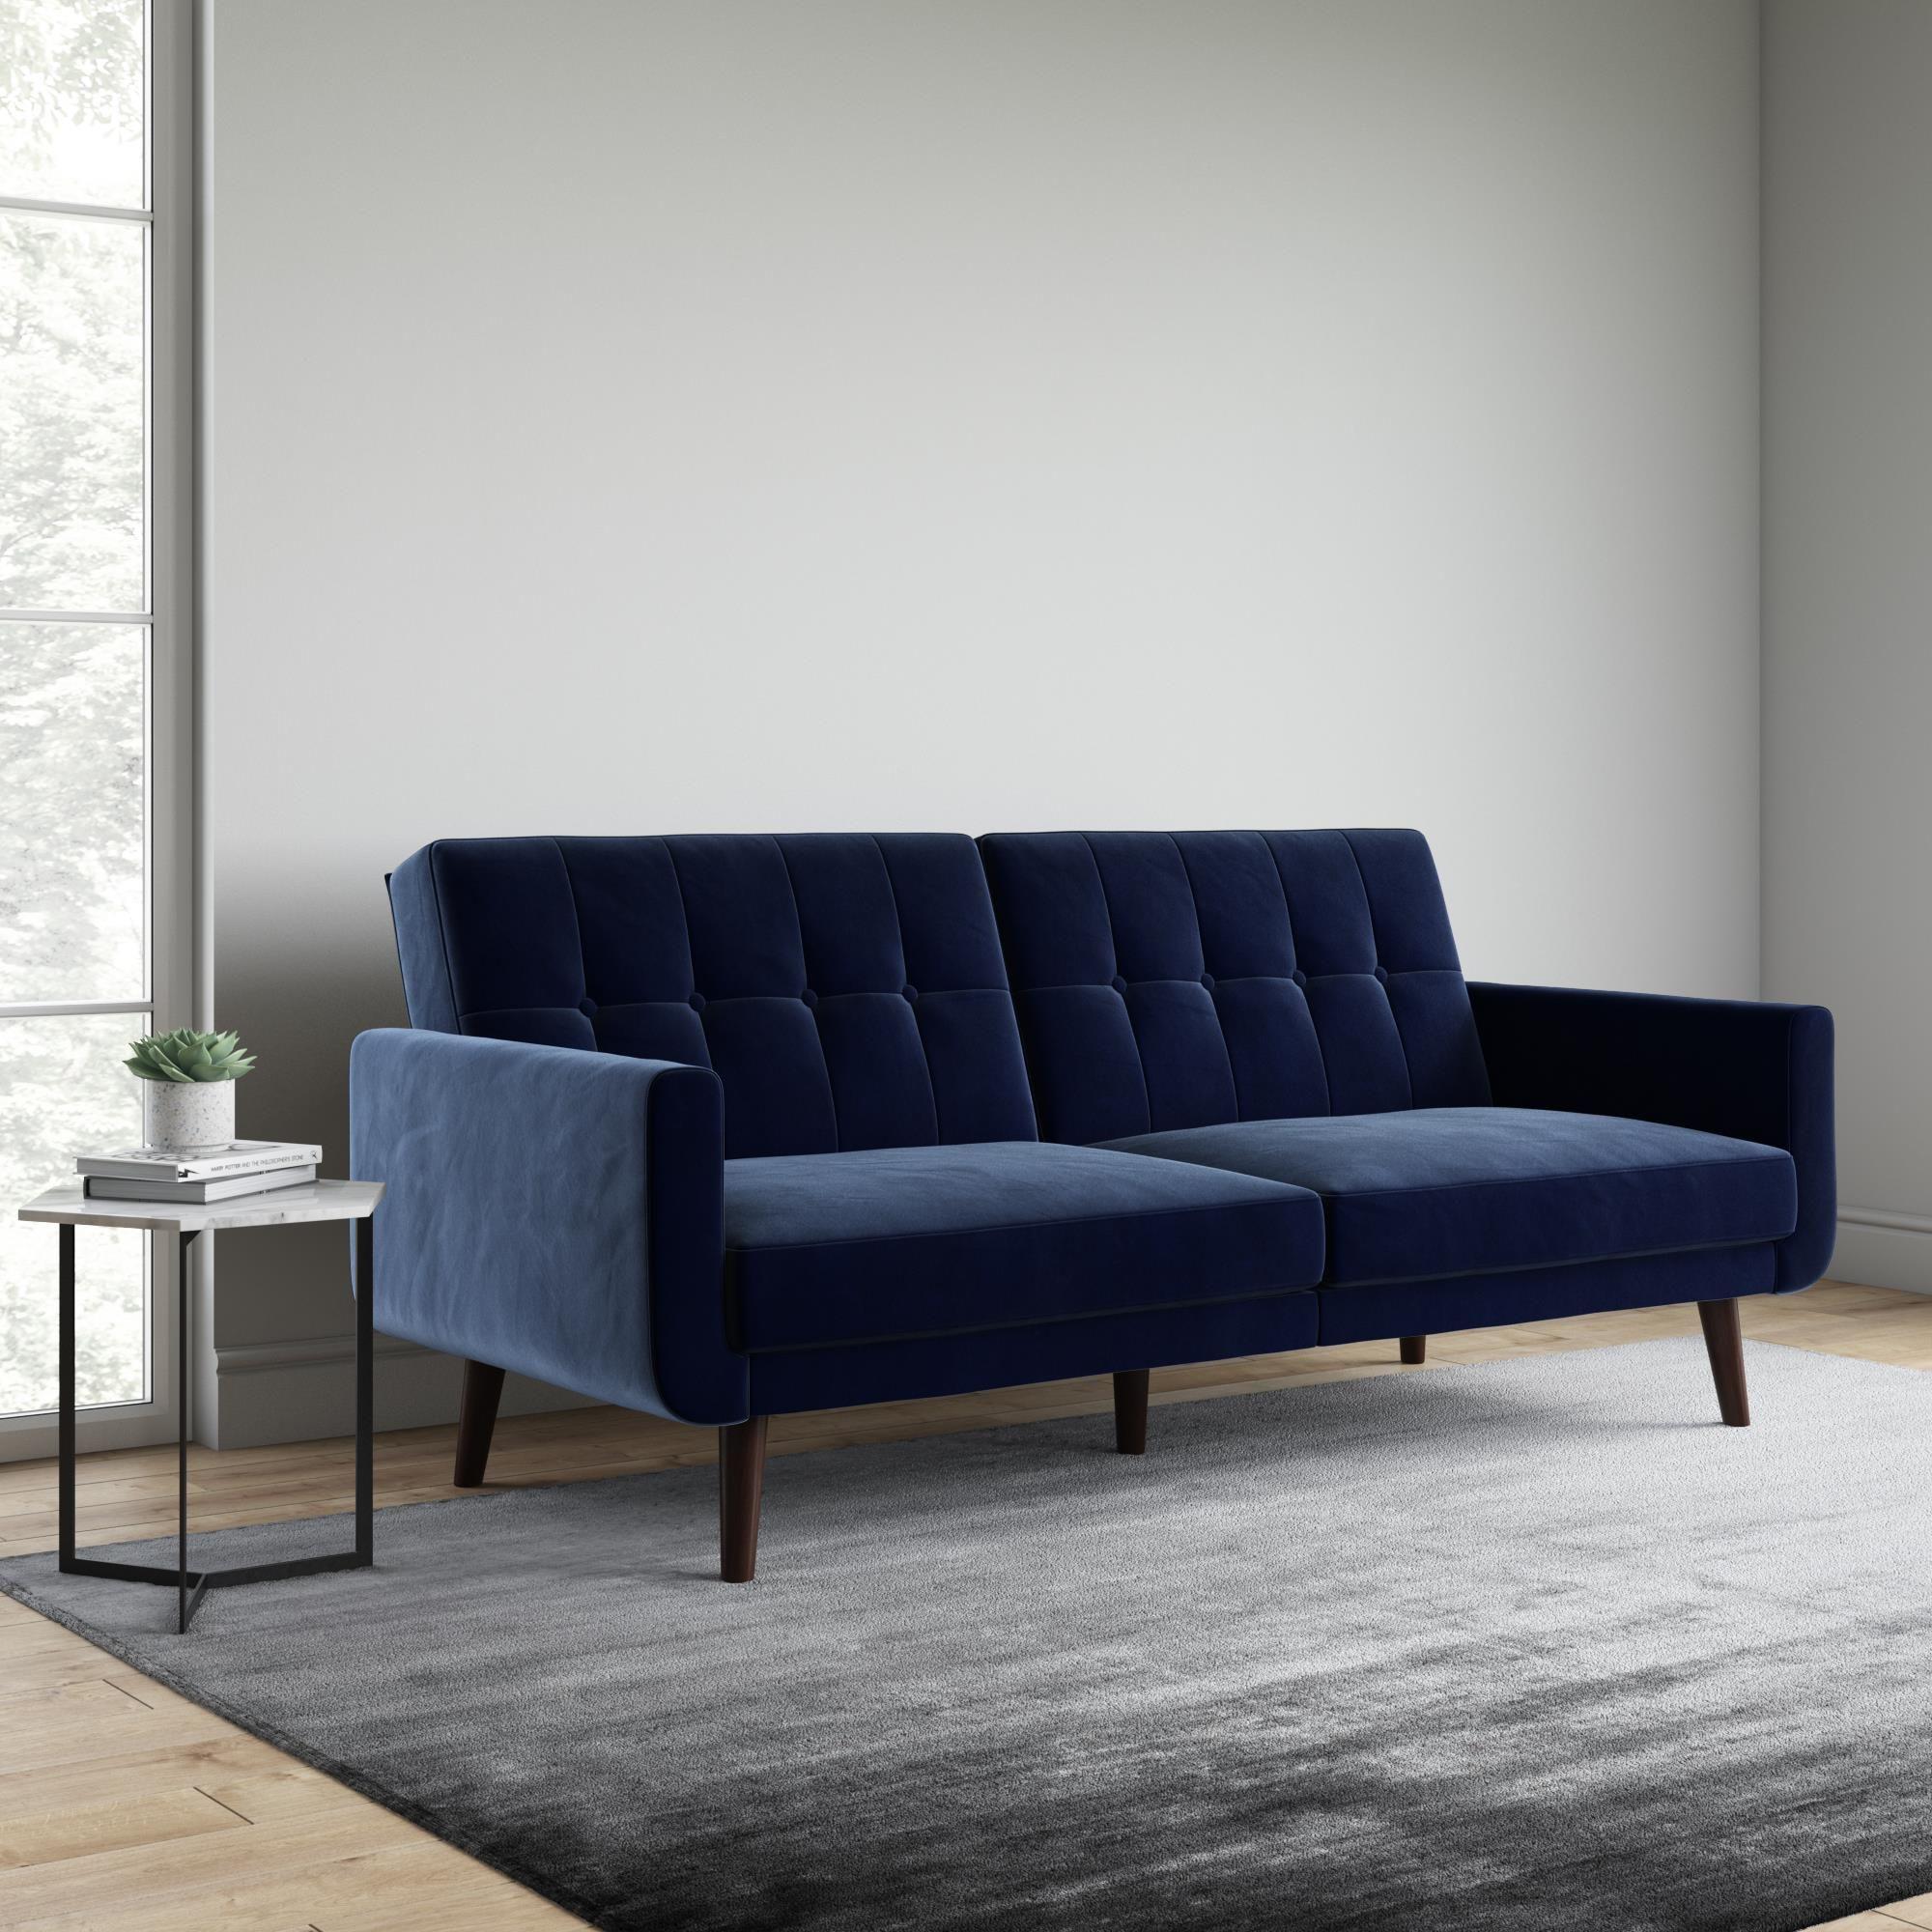 Better Homes And Gardens Nola Modern Futon Blue Velvet Walmart Com Modern Futon Modern Sofa Bed Comfortable Futon